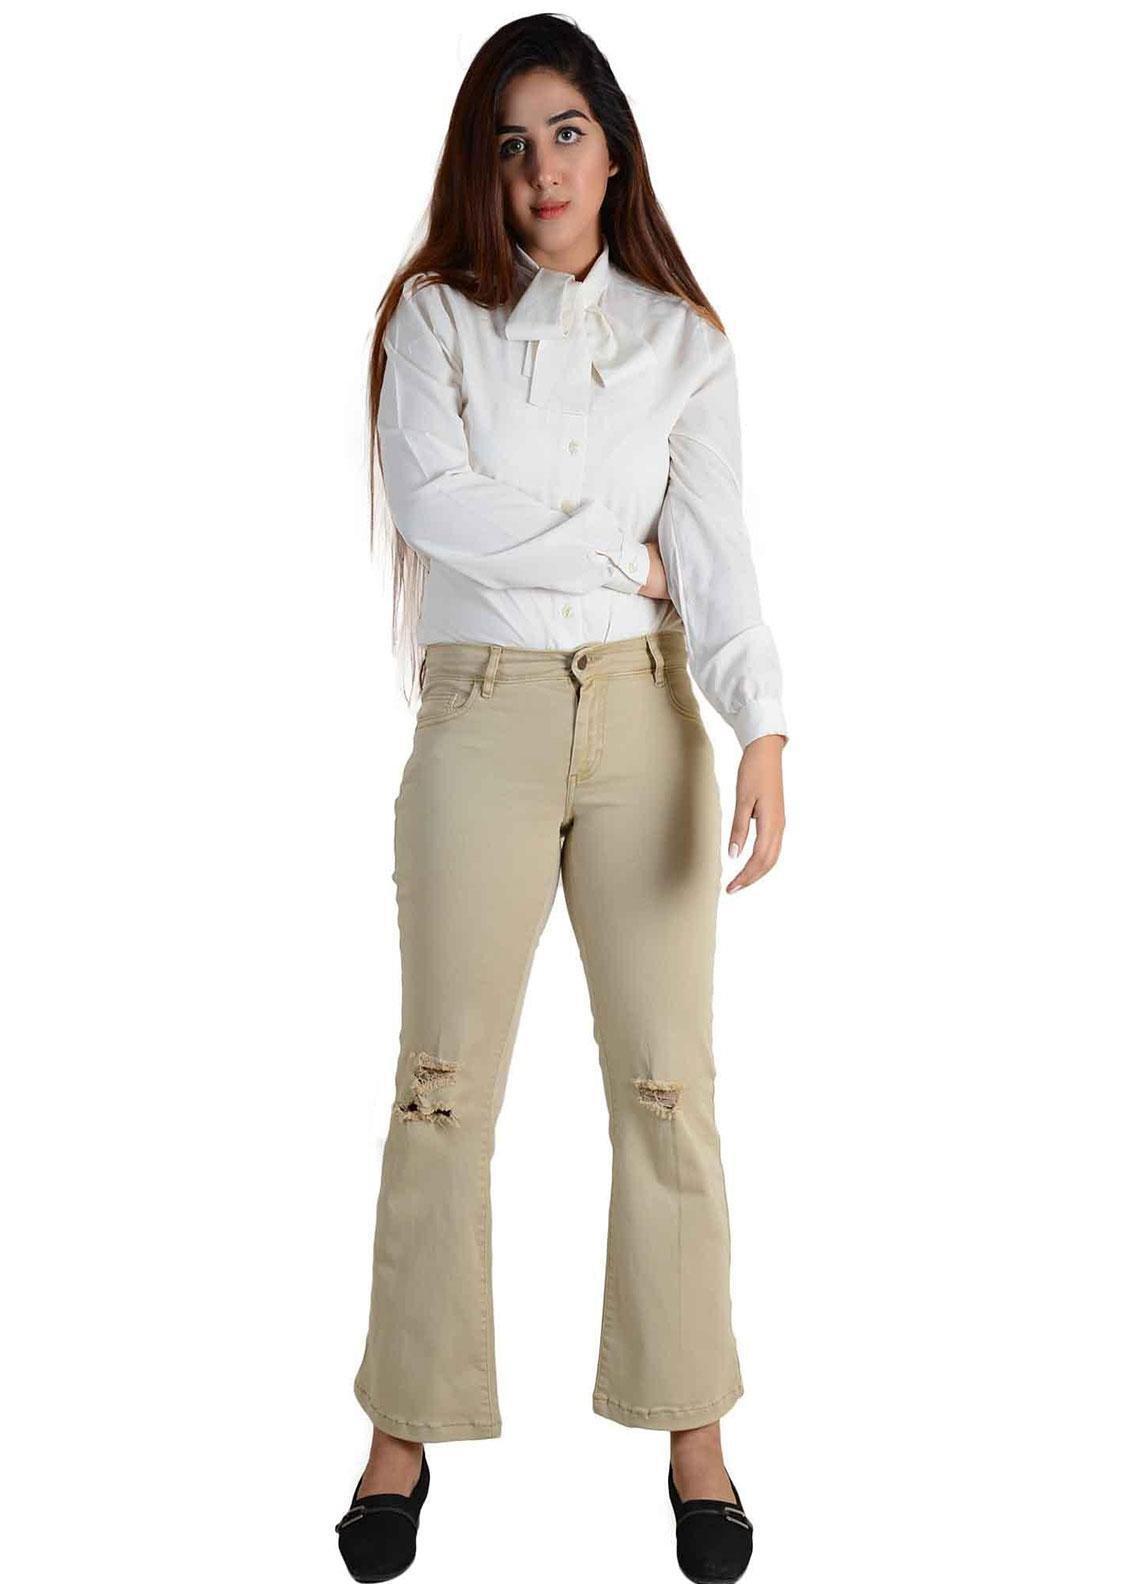 Ignite Wardrobe Stretchable Cotton Boot Cut Pants IG20PNW 008